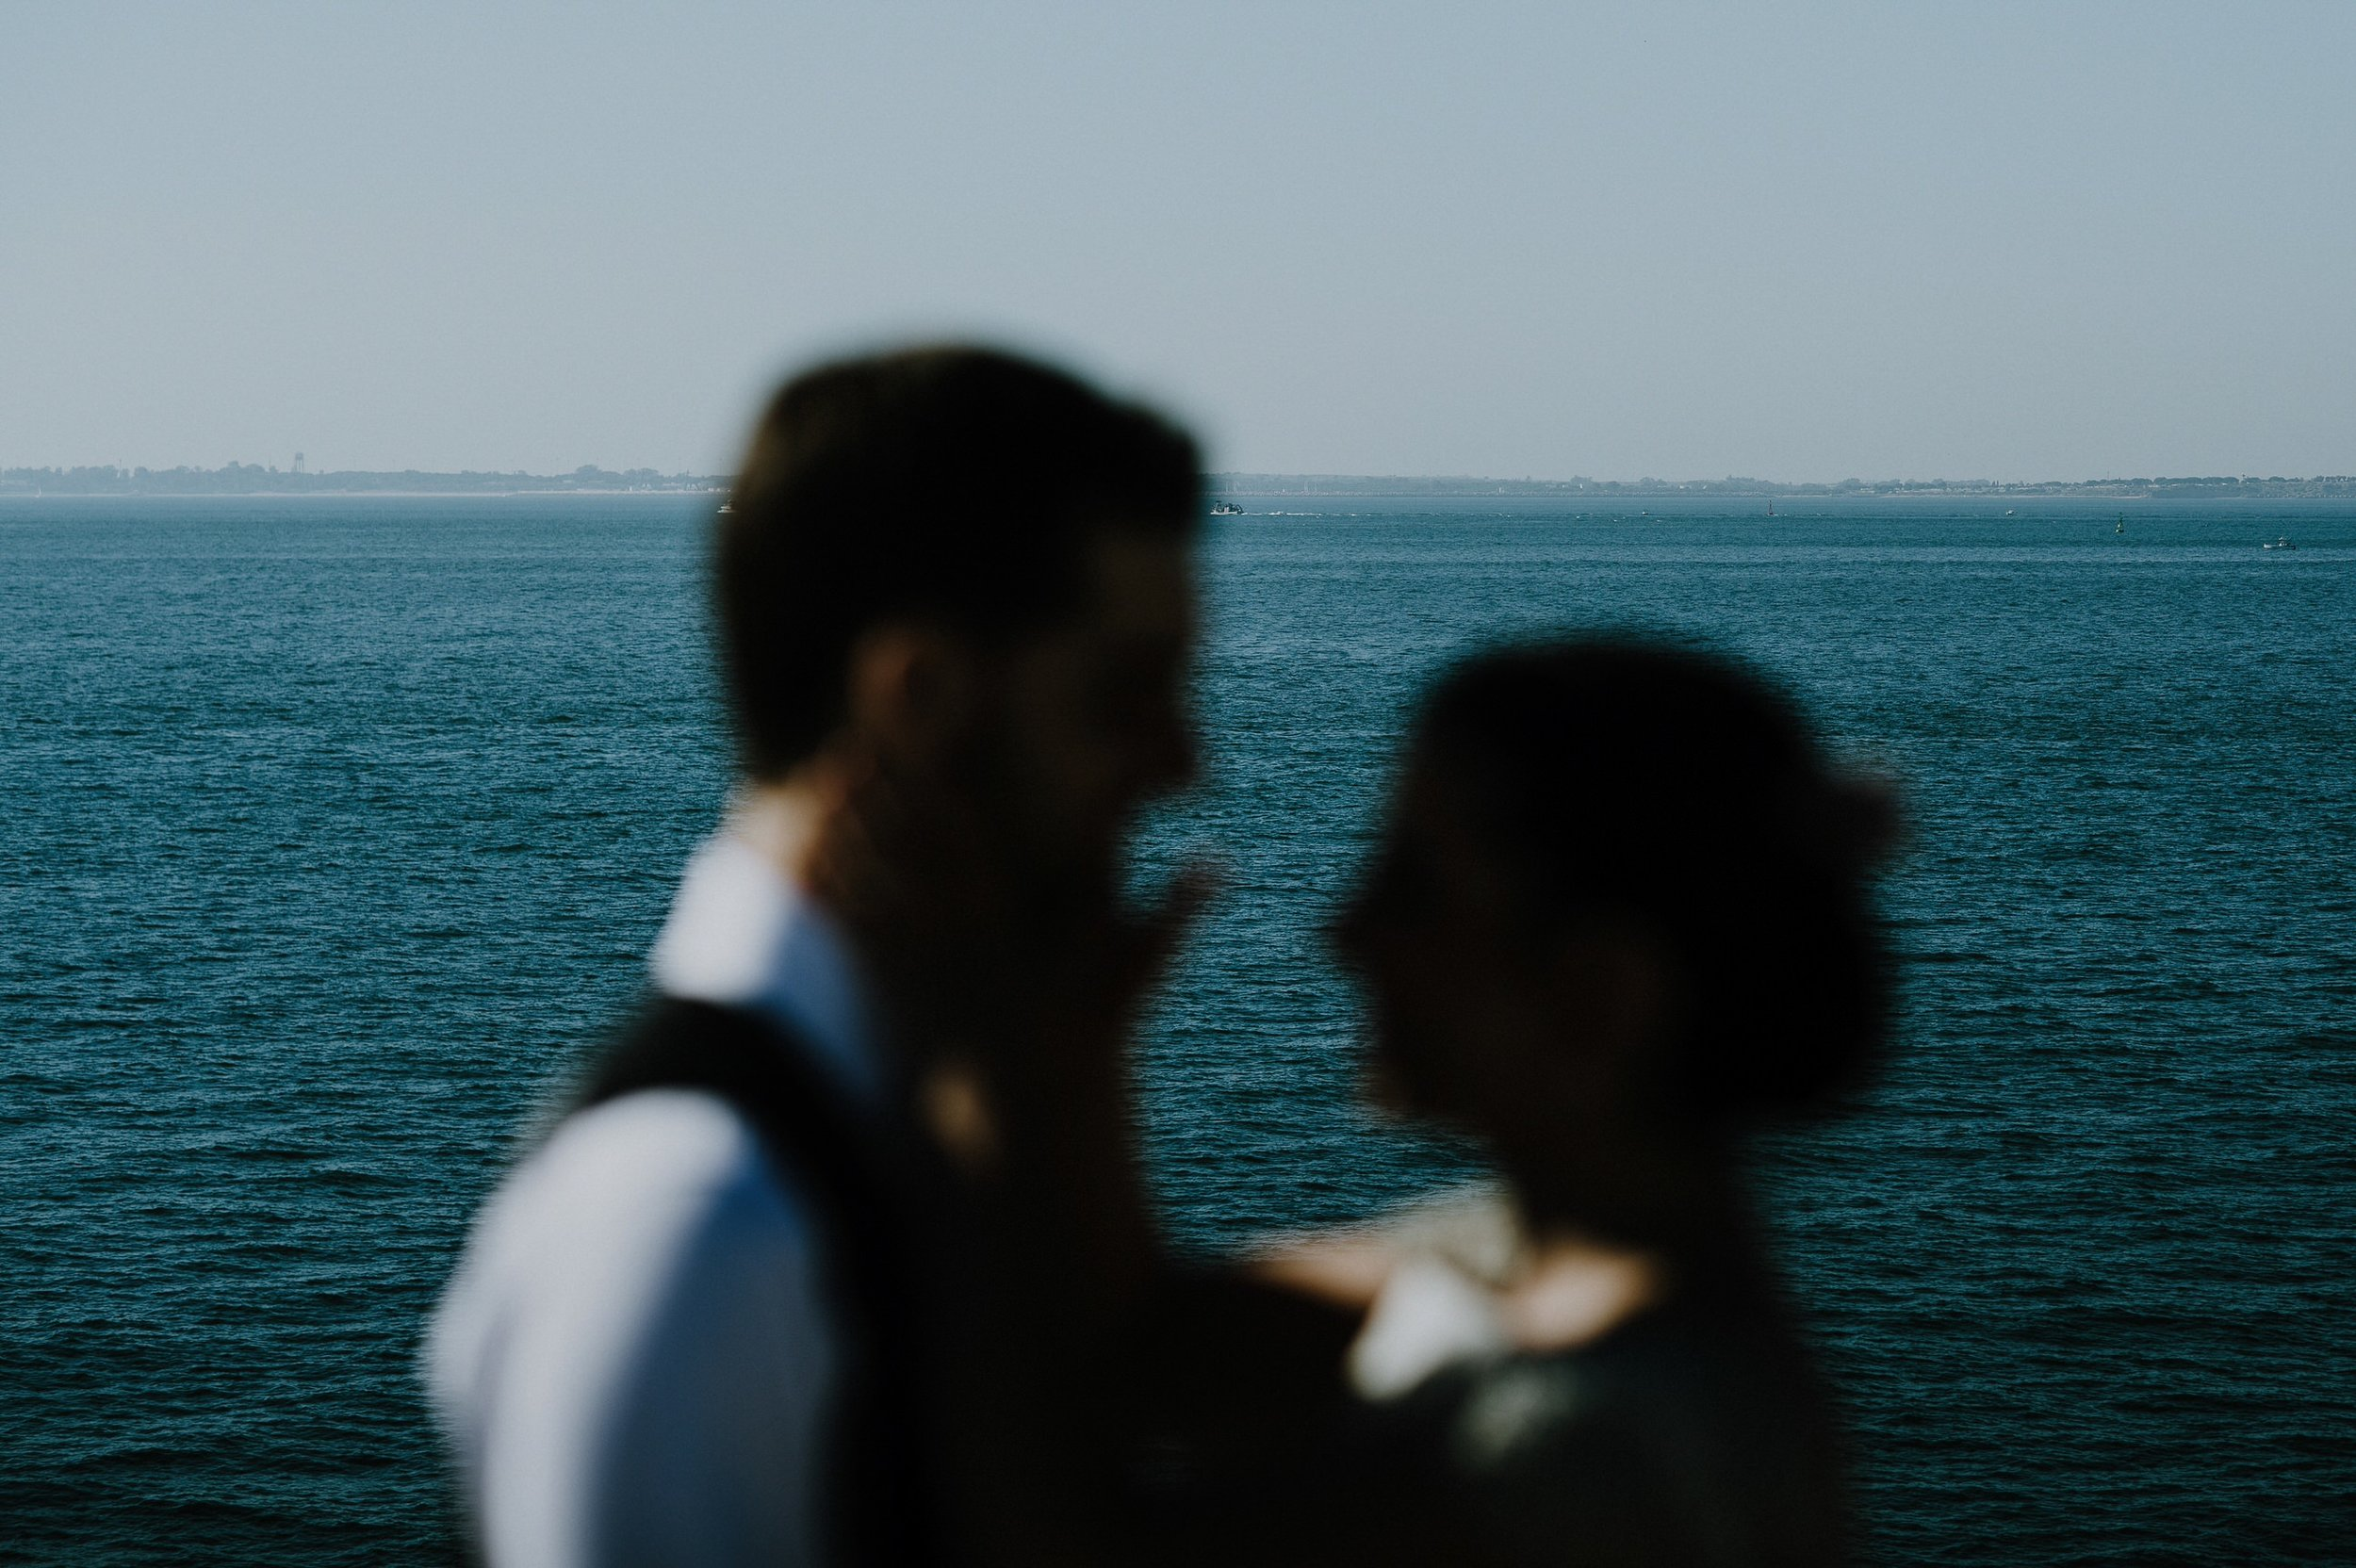 Laura & Rubén - boda en utrera - Santa clotilde- Manolo mayo - Fotografo de boda - Andrés Amarillo AAA_1075-Exposure (103).jpg